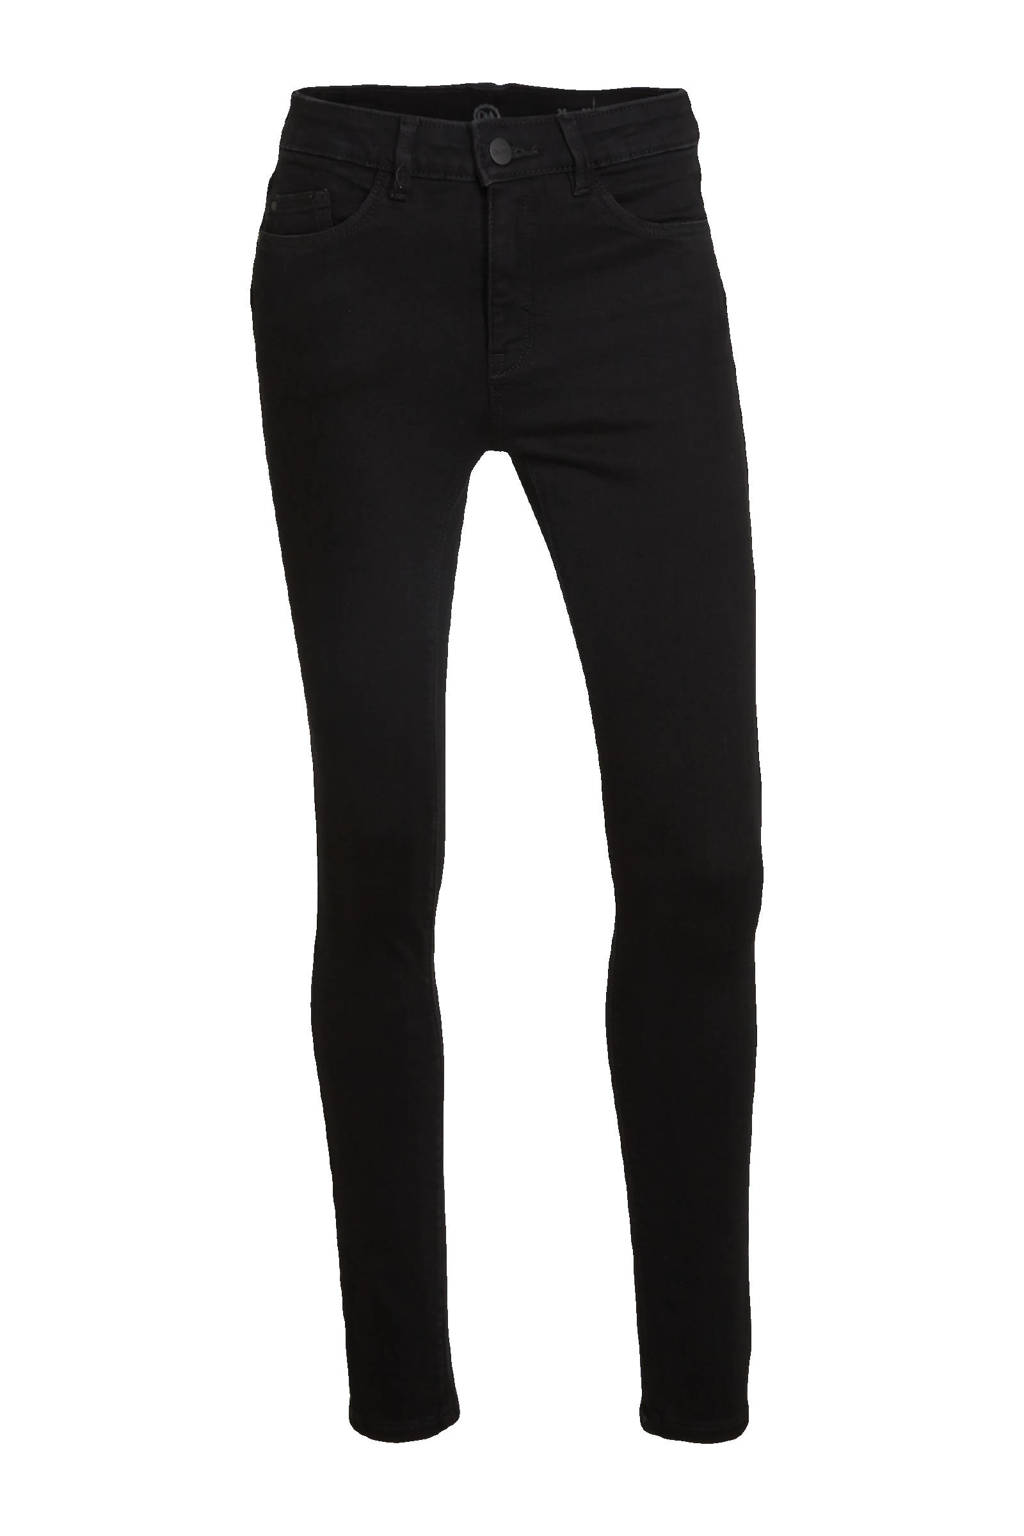 C&A The Denim skinny jeans The Denim zwart, Zwart